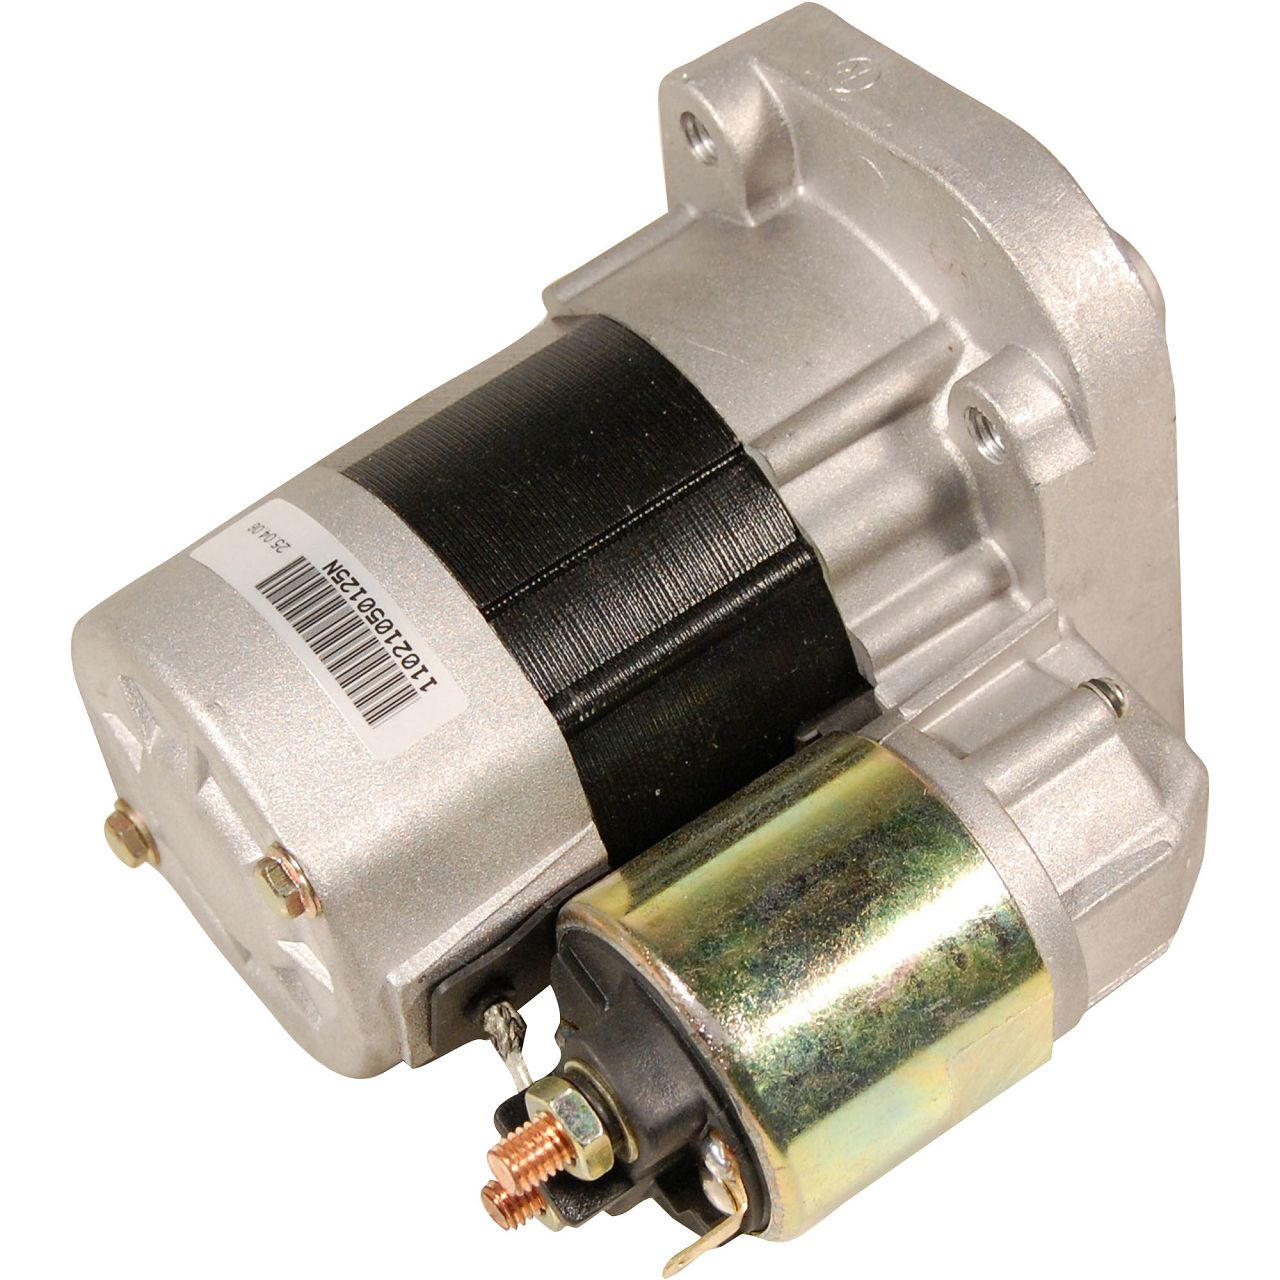 Anlasser Starter 12V 0,85KW für CLIO KANGOO LAGUNA MEGANE 1.4/1.6 16V 95/107 PS